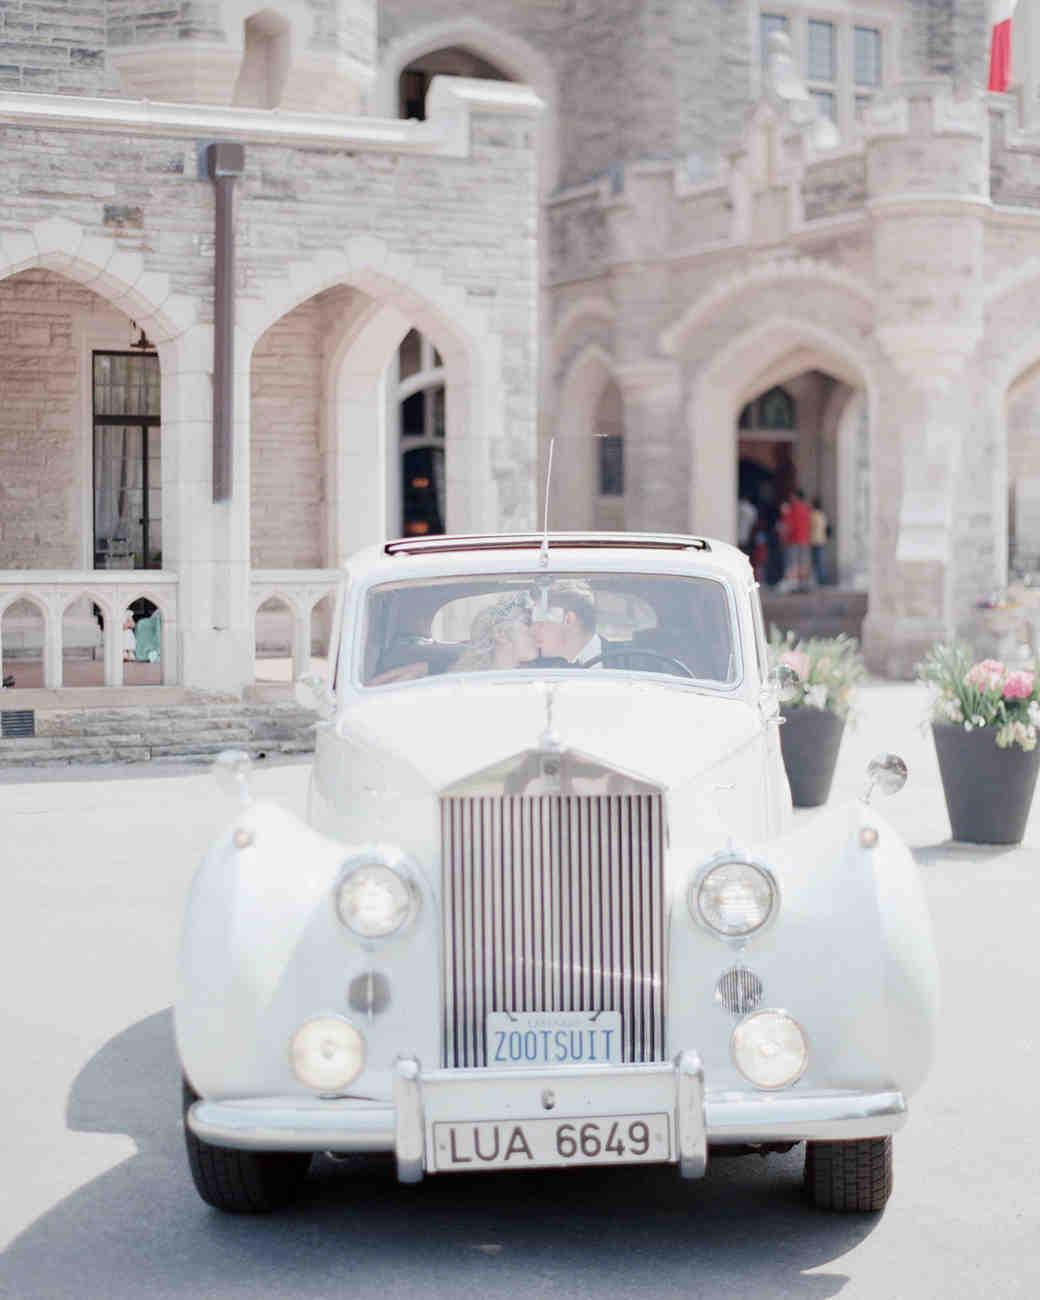 brittany-jeff-wedding-car-081-s111415-0714.jpg